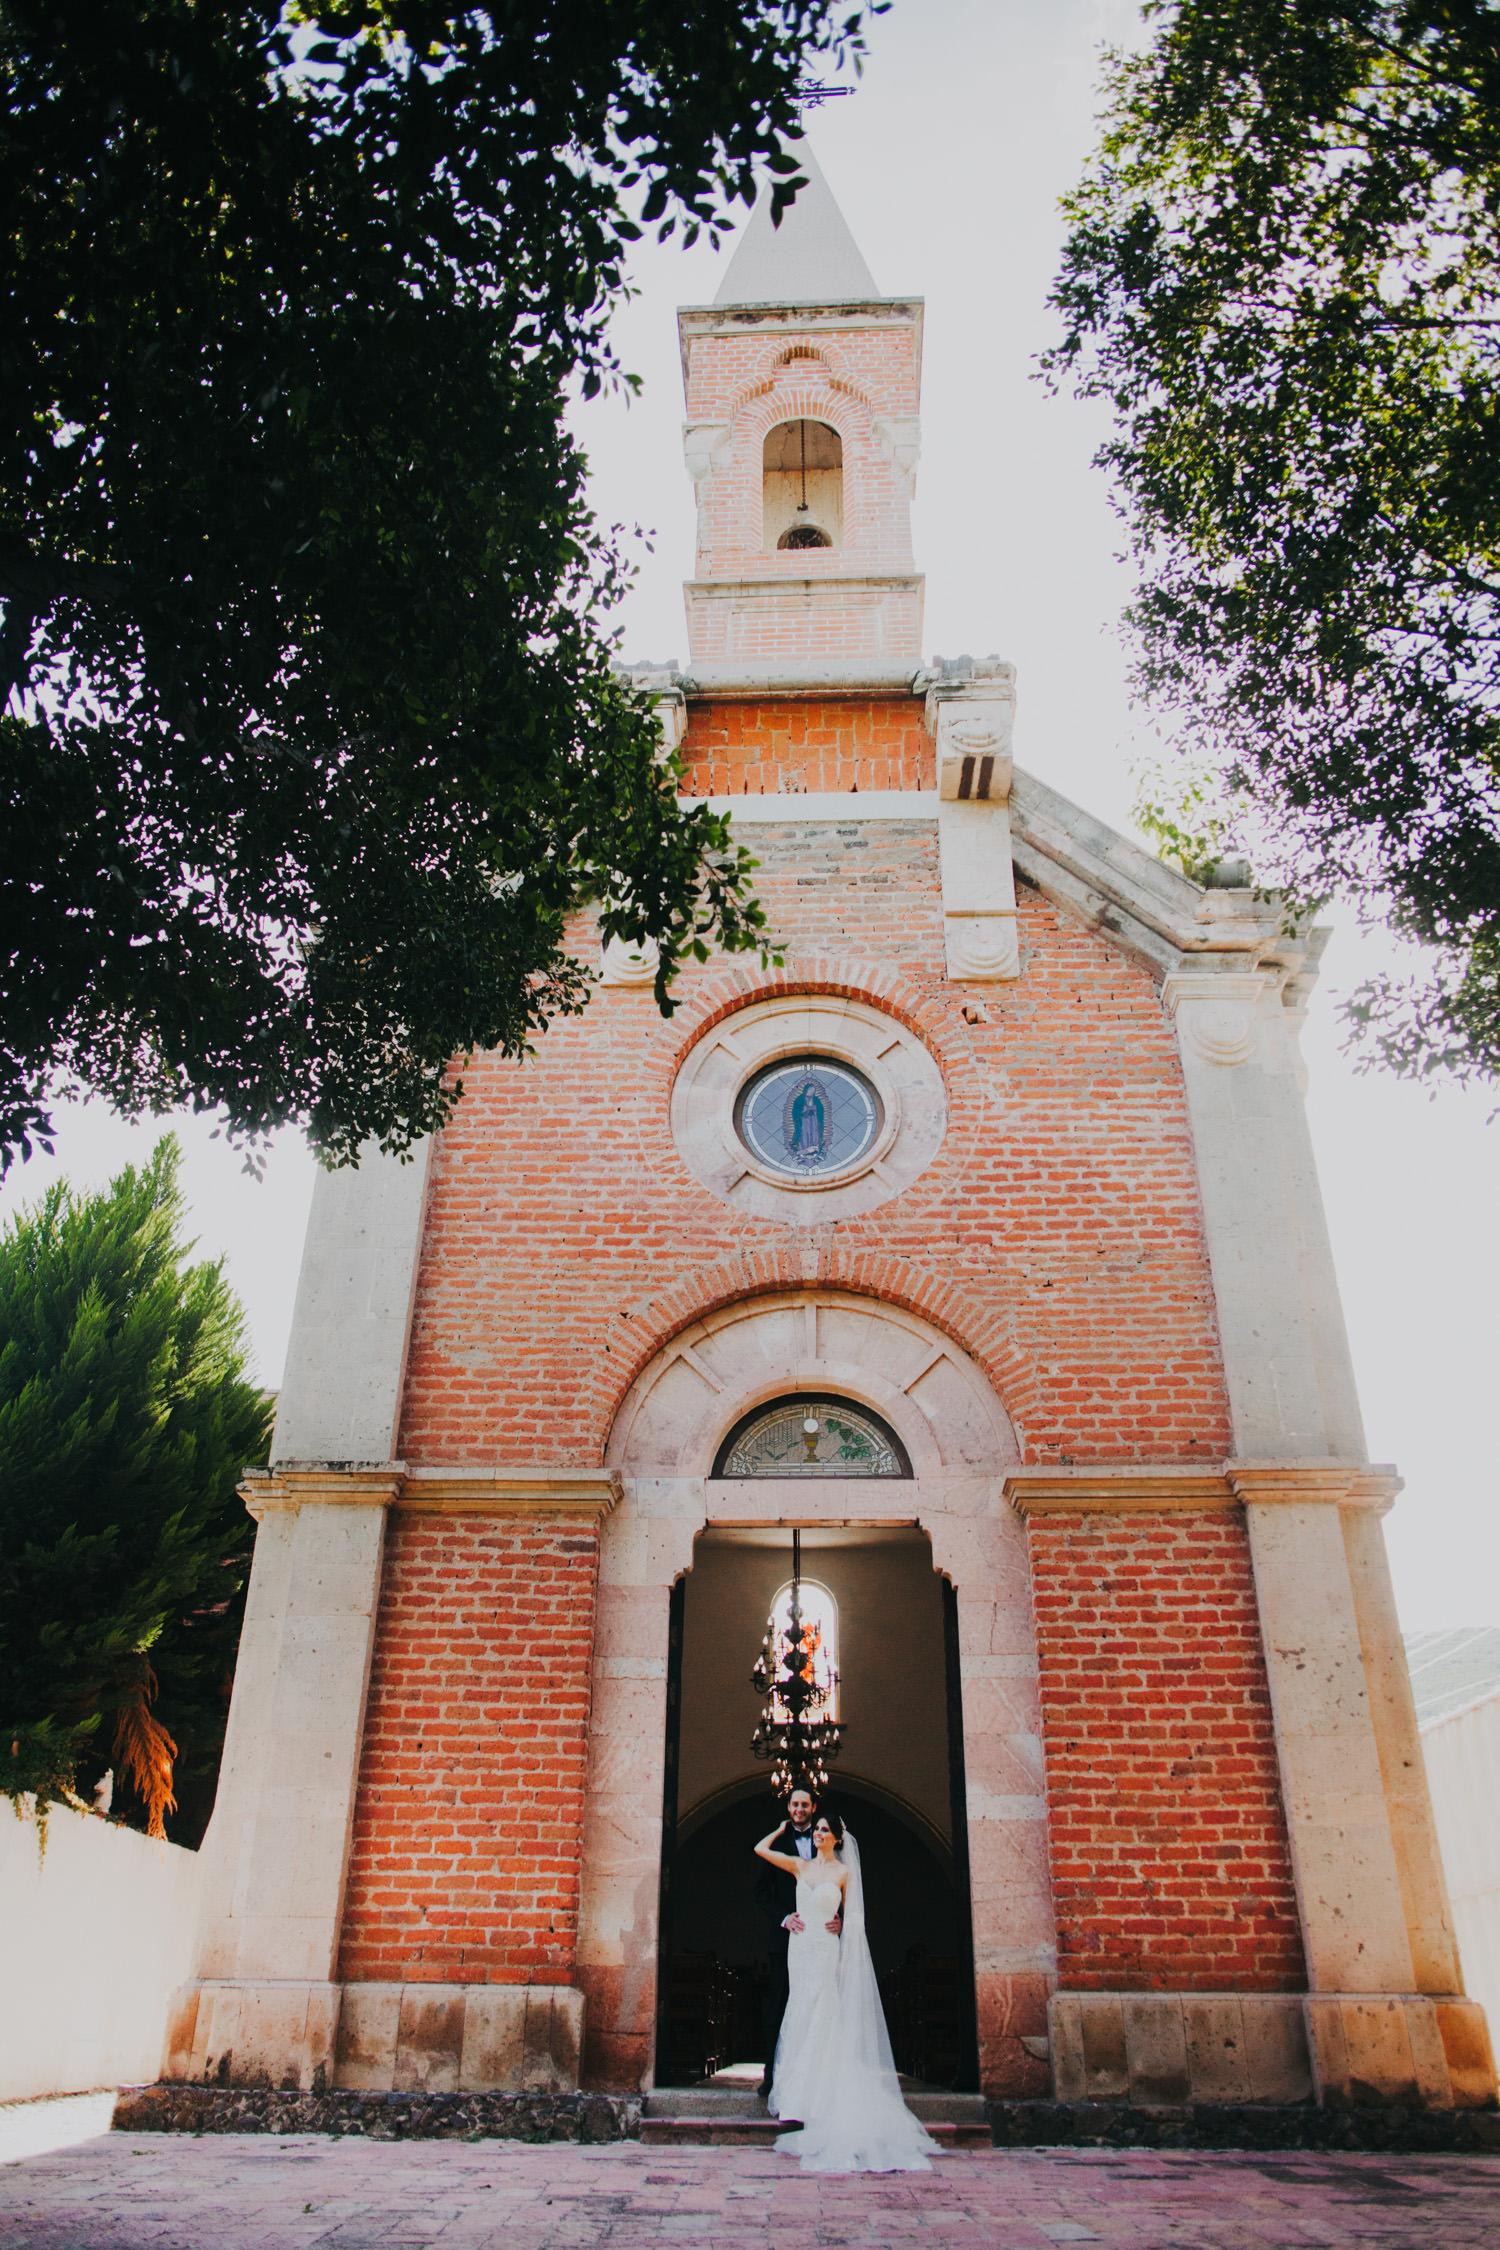 irapuato-boda-fotografia-jardines-alcalde-guanajuato-paulina-juan-pedro--18.jpg